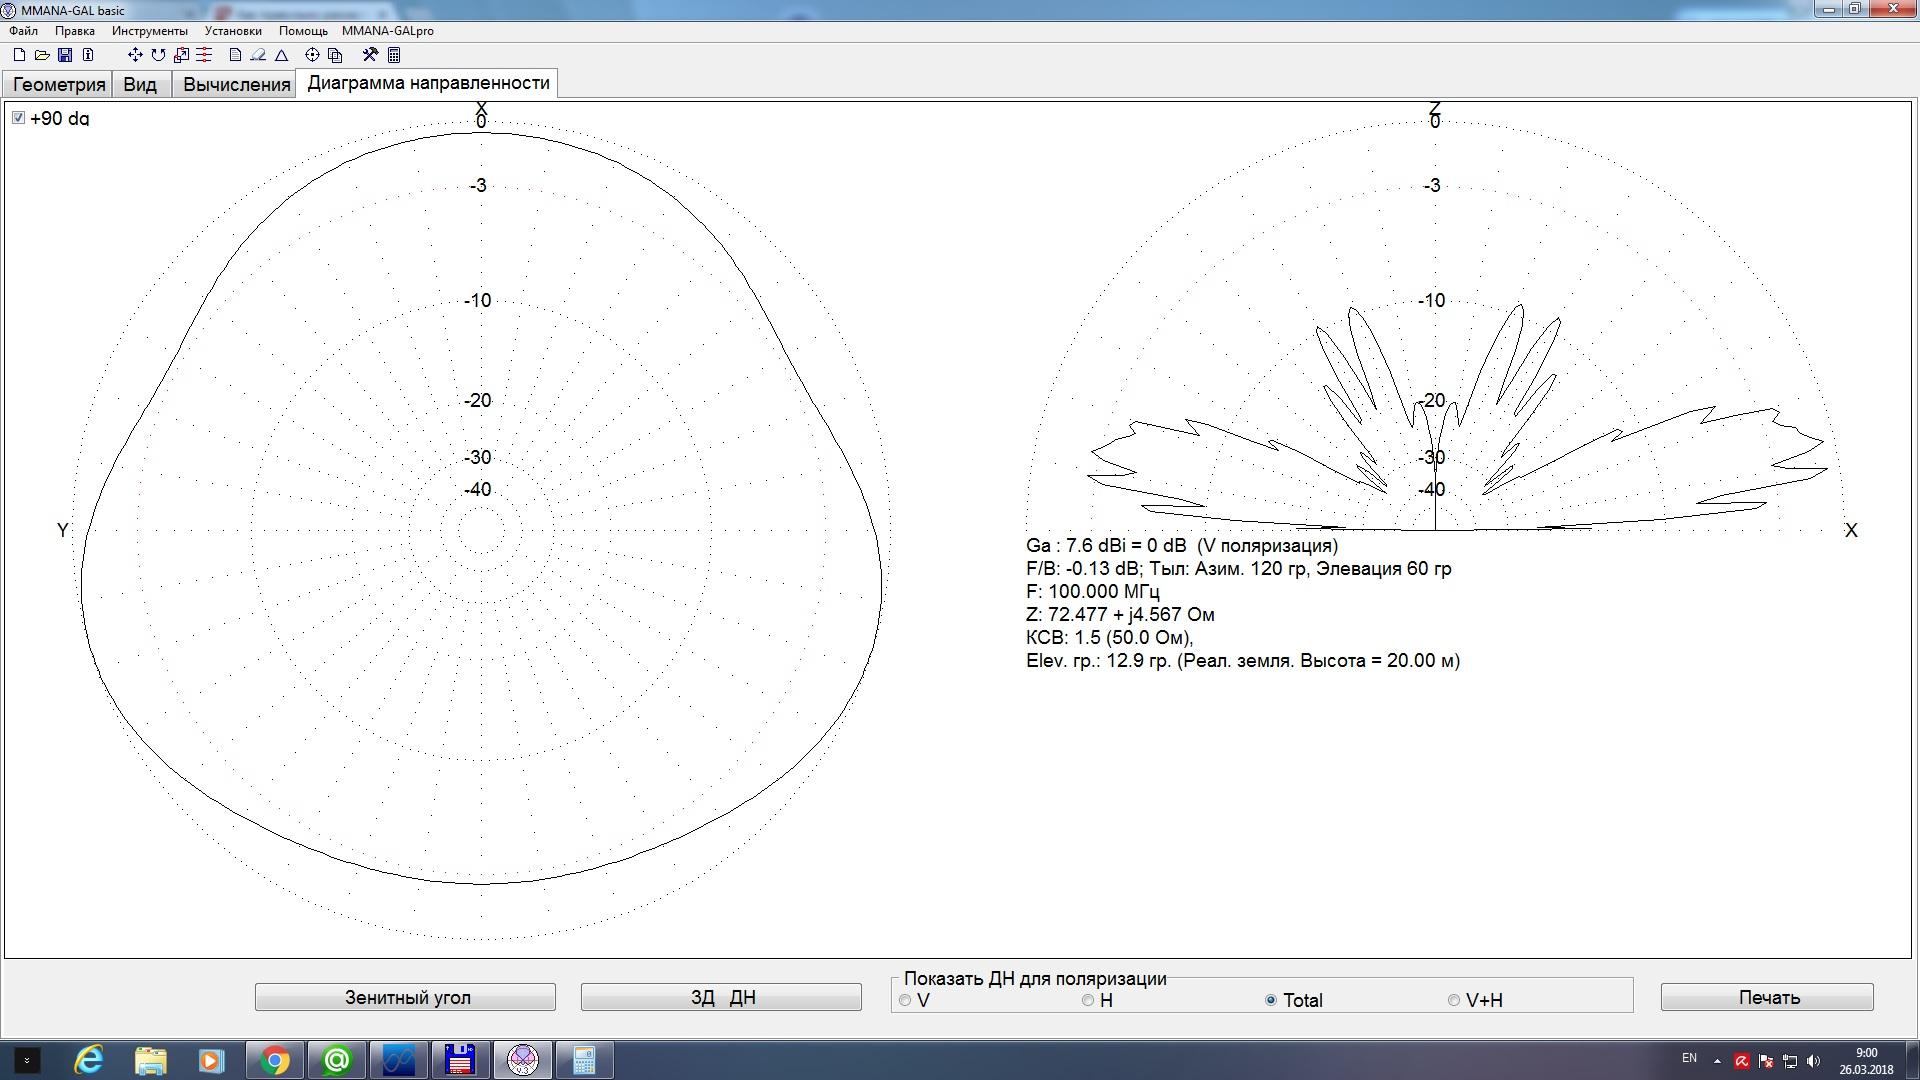 Нажмите на изображение для увеличения.  Название:ant truba.jpg Просмотров:13 Размер:326.4 Кб ID:208719